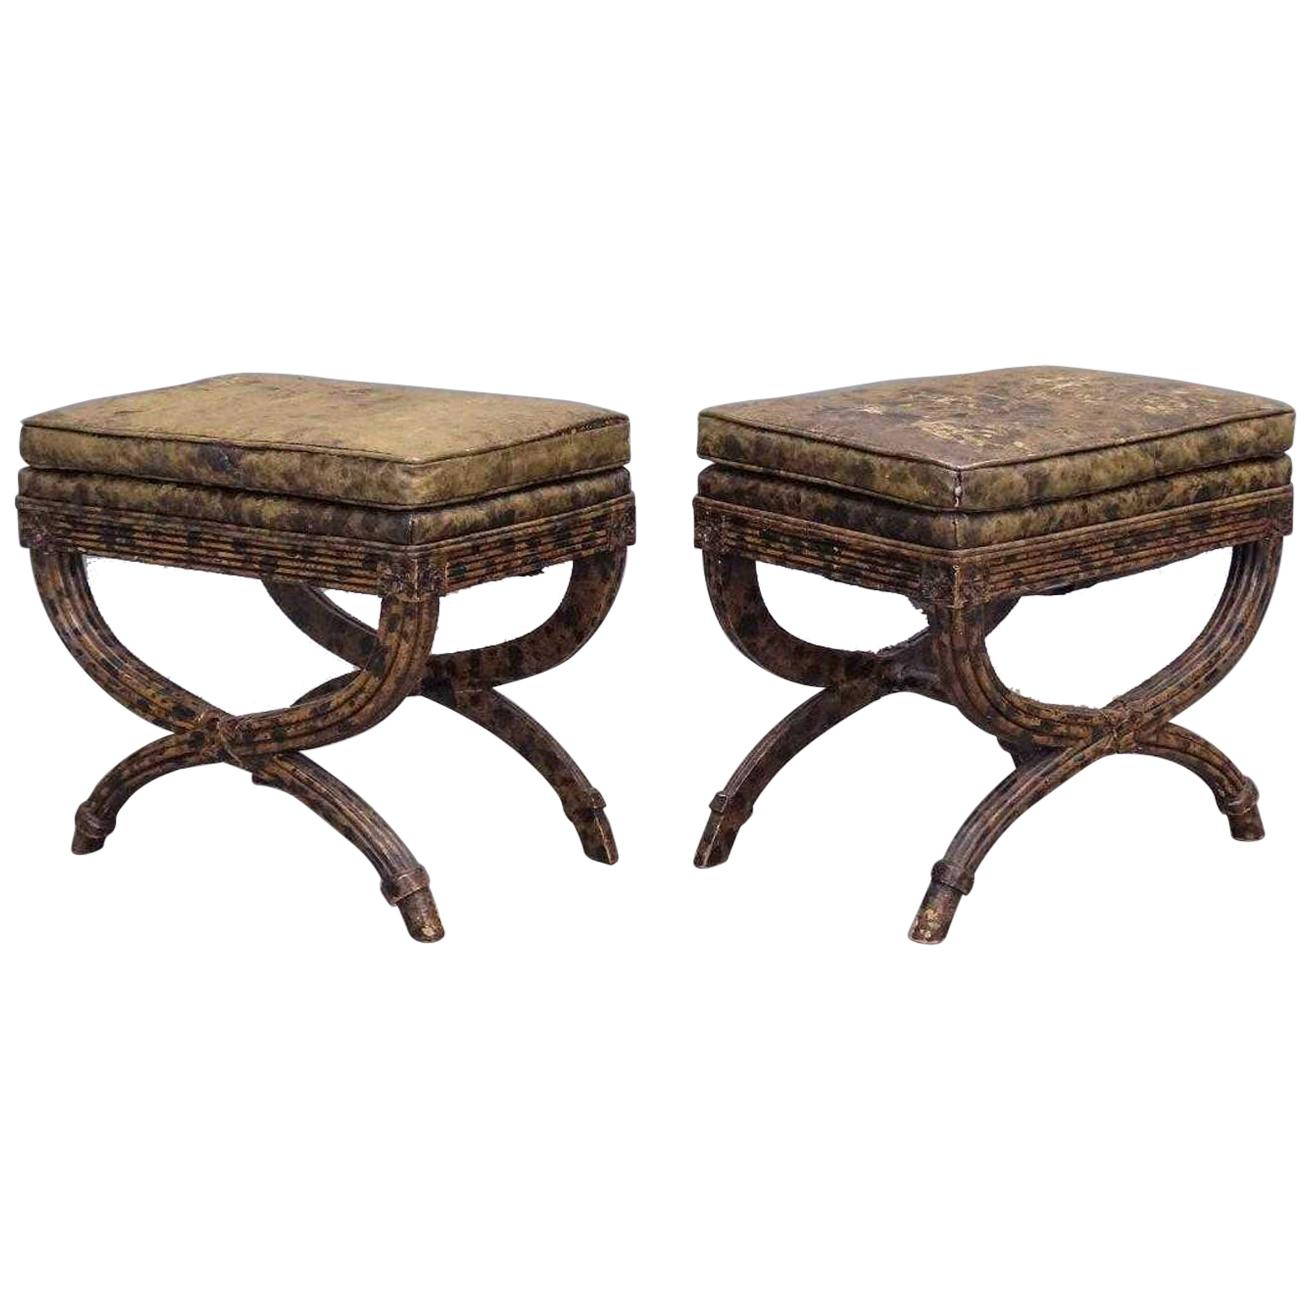 Vintage Pair of Decorative Neoclassical Curule Stools